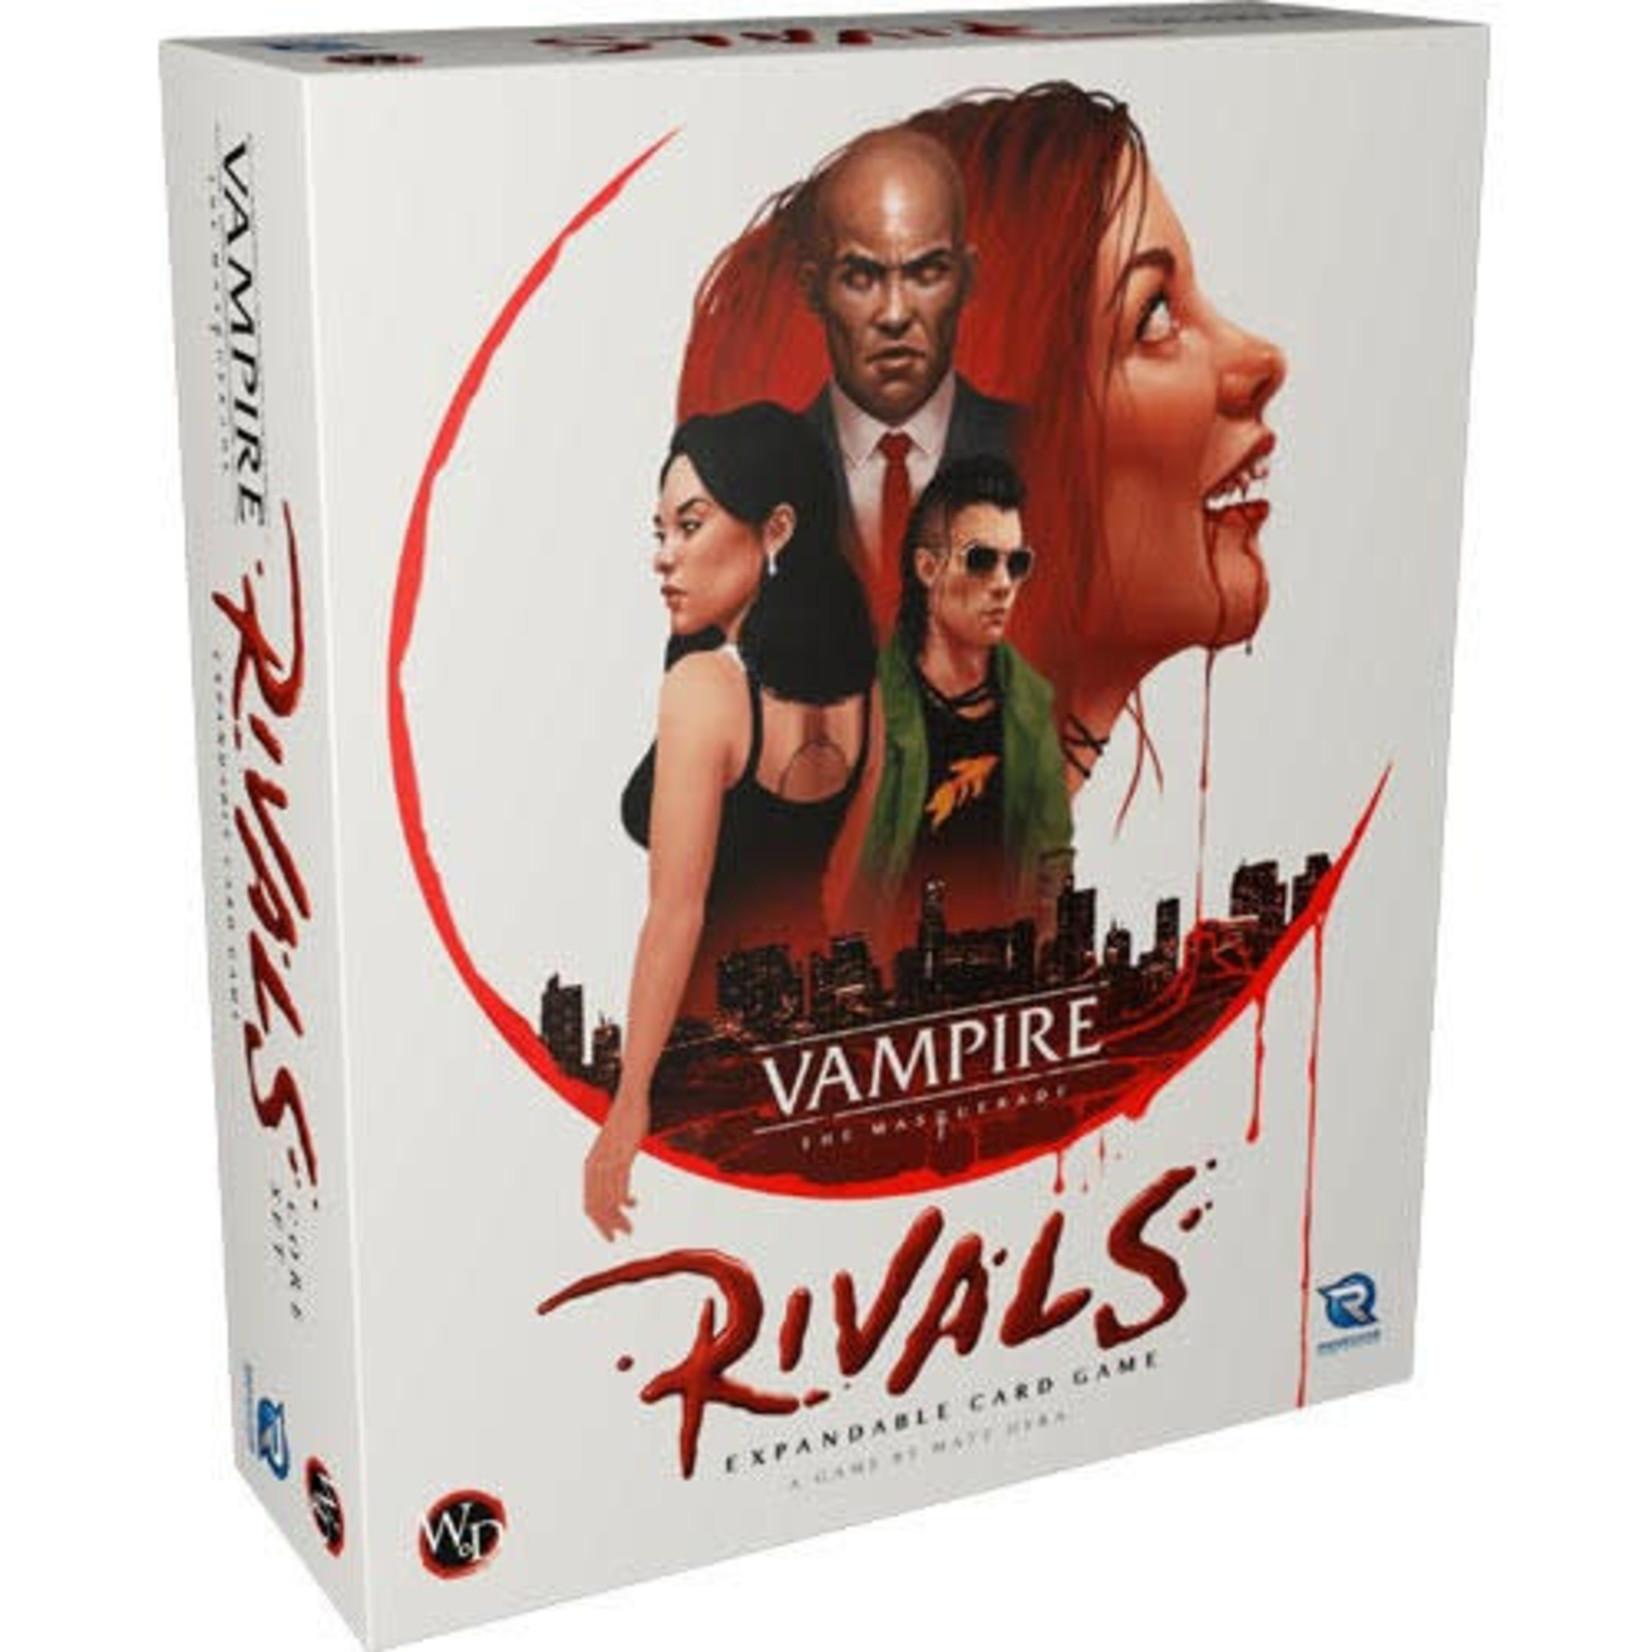 Vampire The Masquerade Rivals ECG Card Game